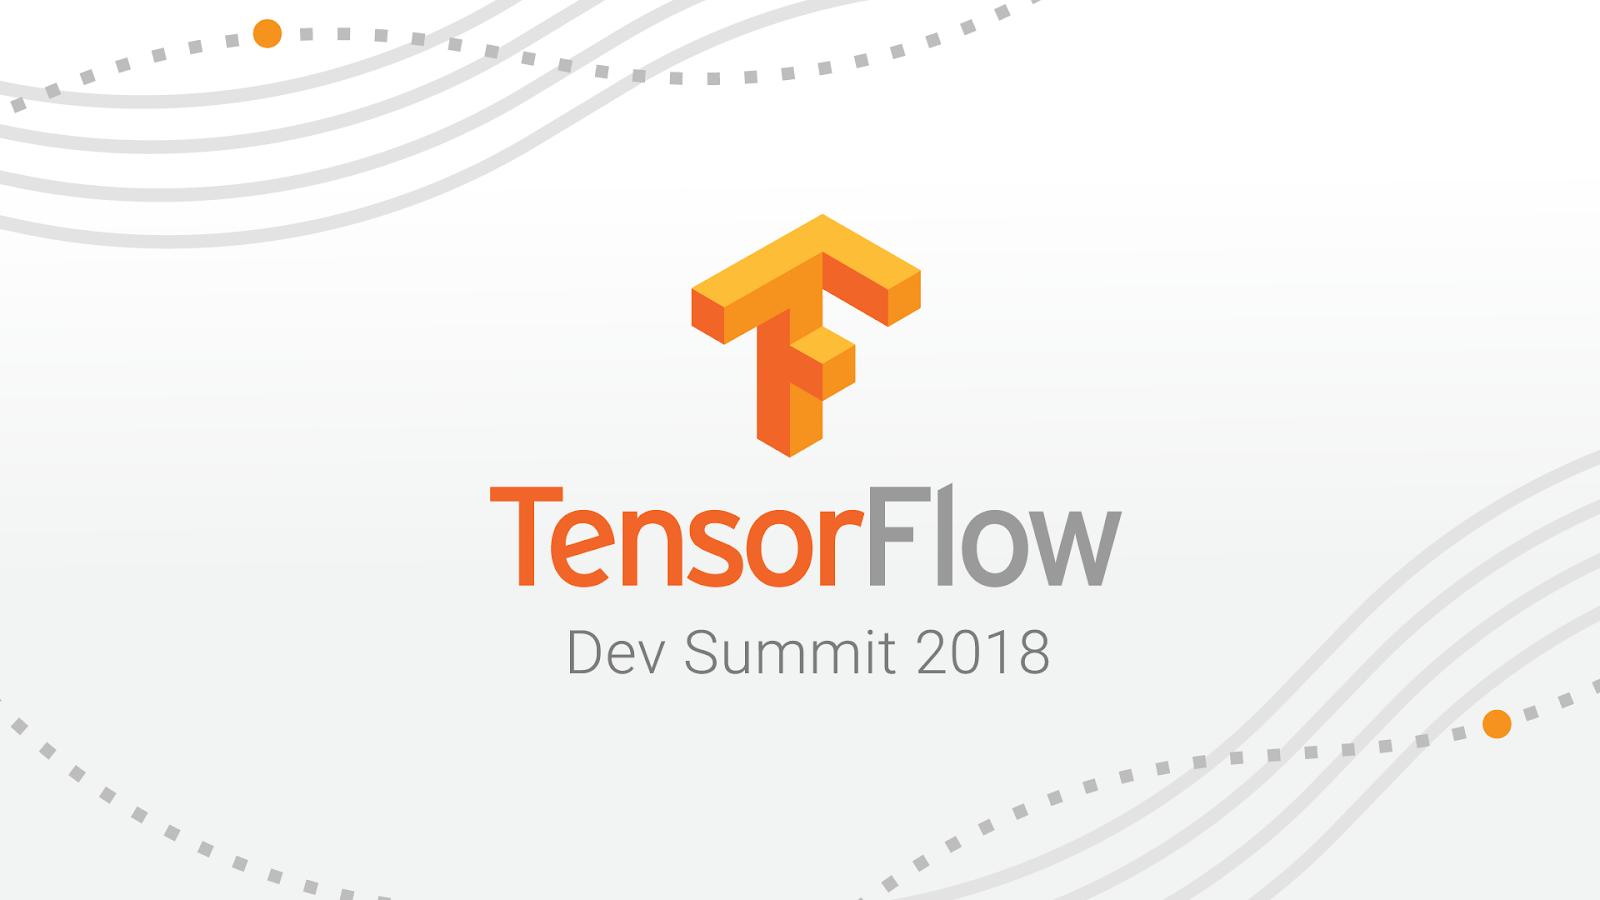 TensorFlow Dev Summit